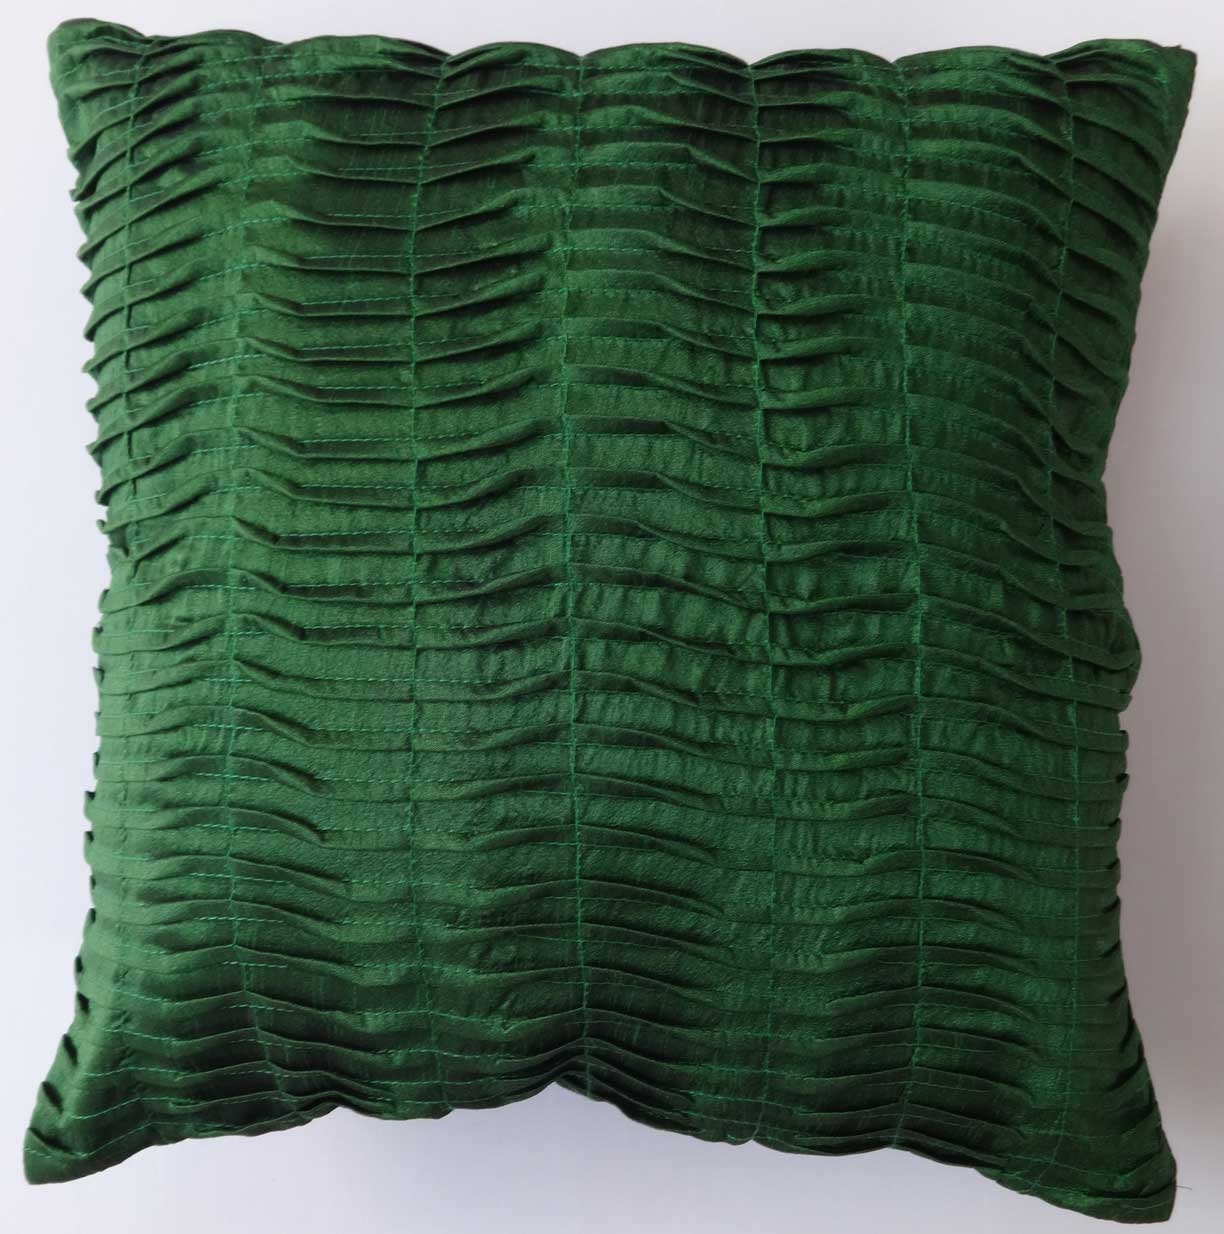 Kelly Green Throw Pillow : Kelly green pleated throw pillow. 16 inch. art silk